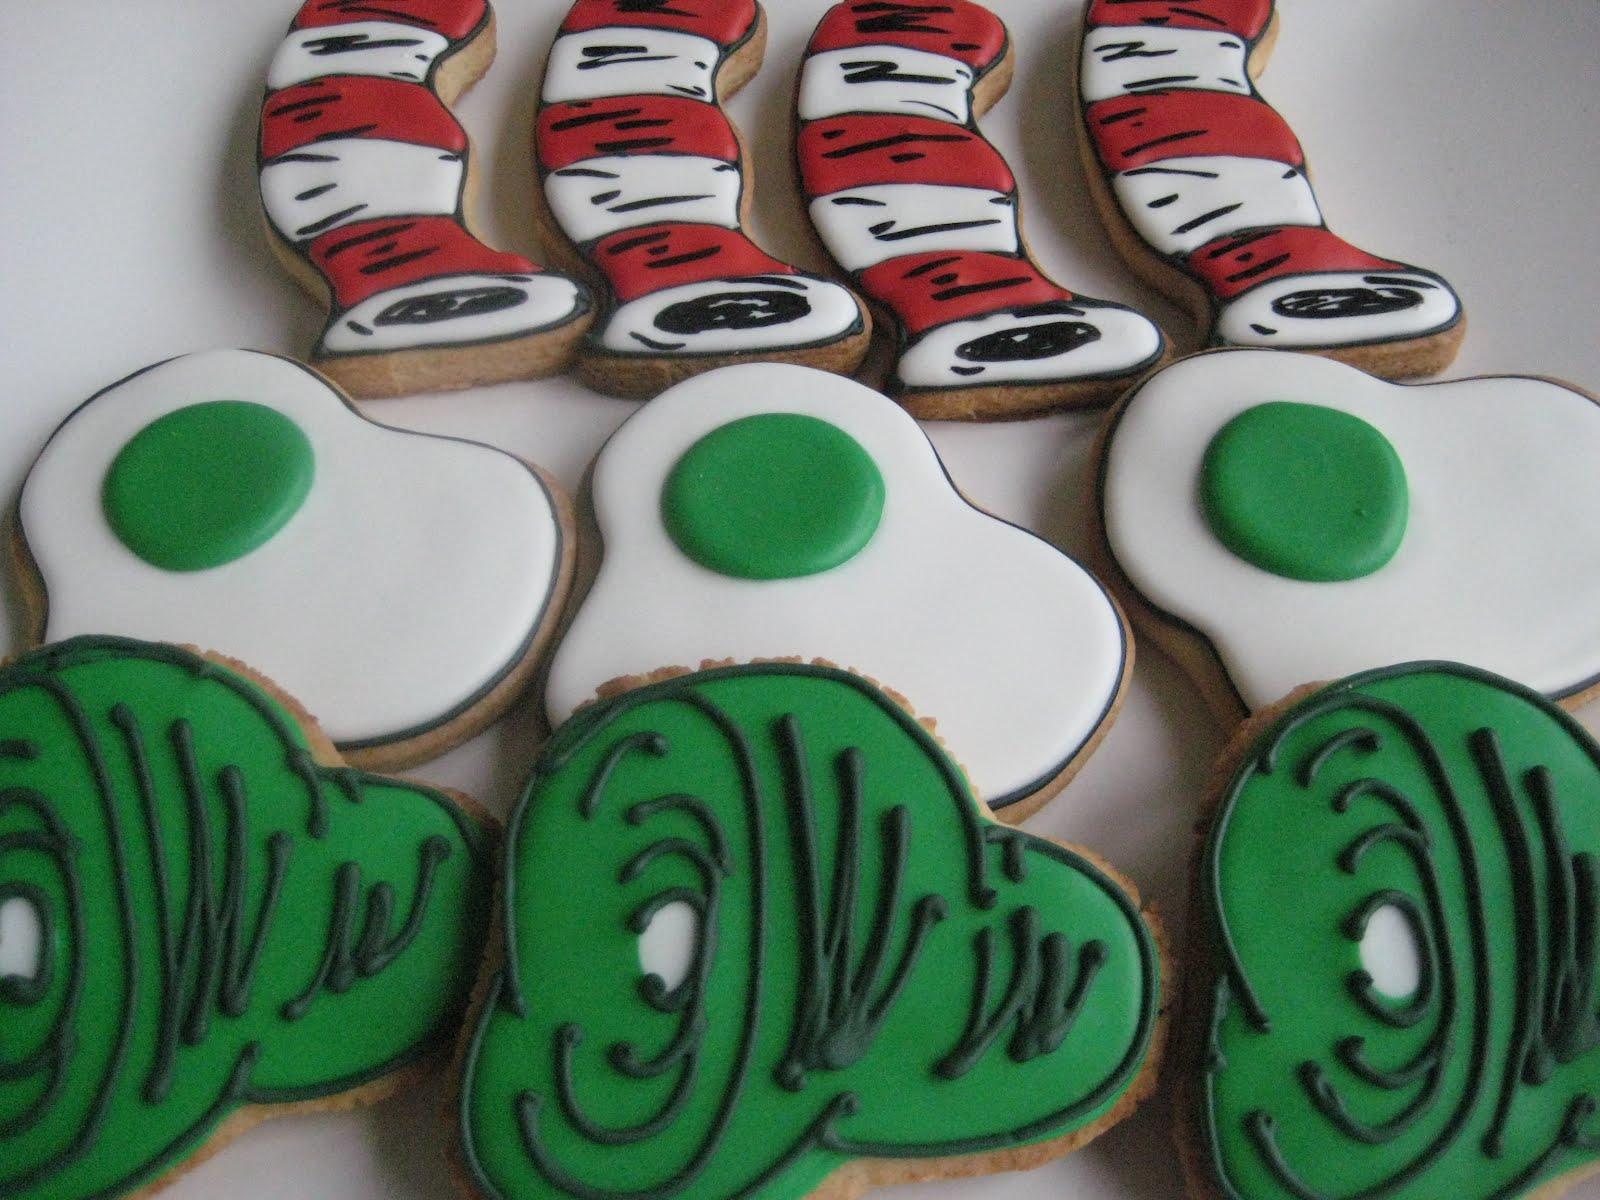 sugarlily cookie company: i do so like green eggs and ham!